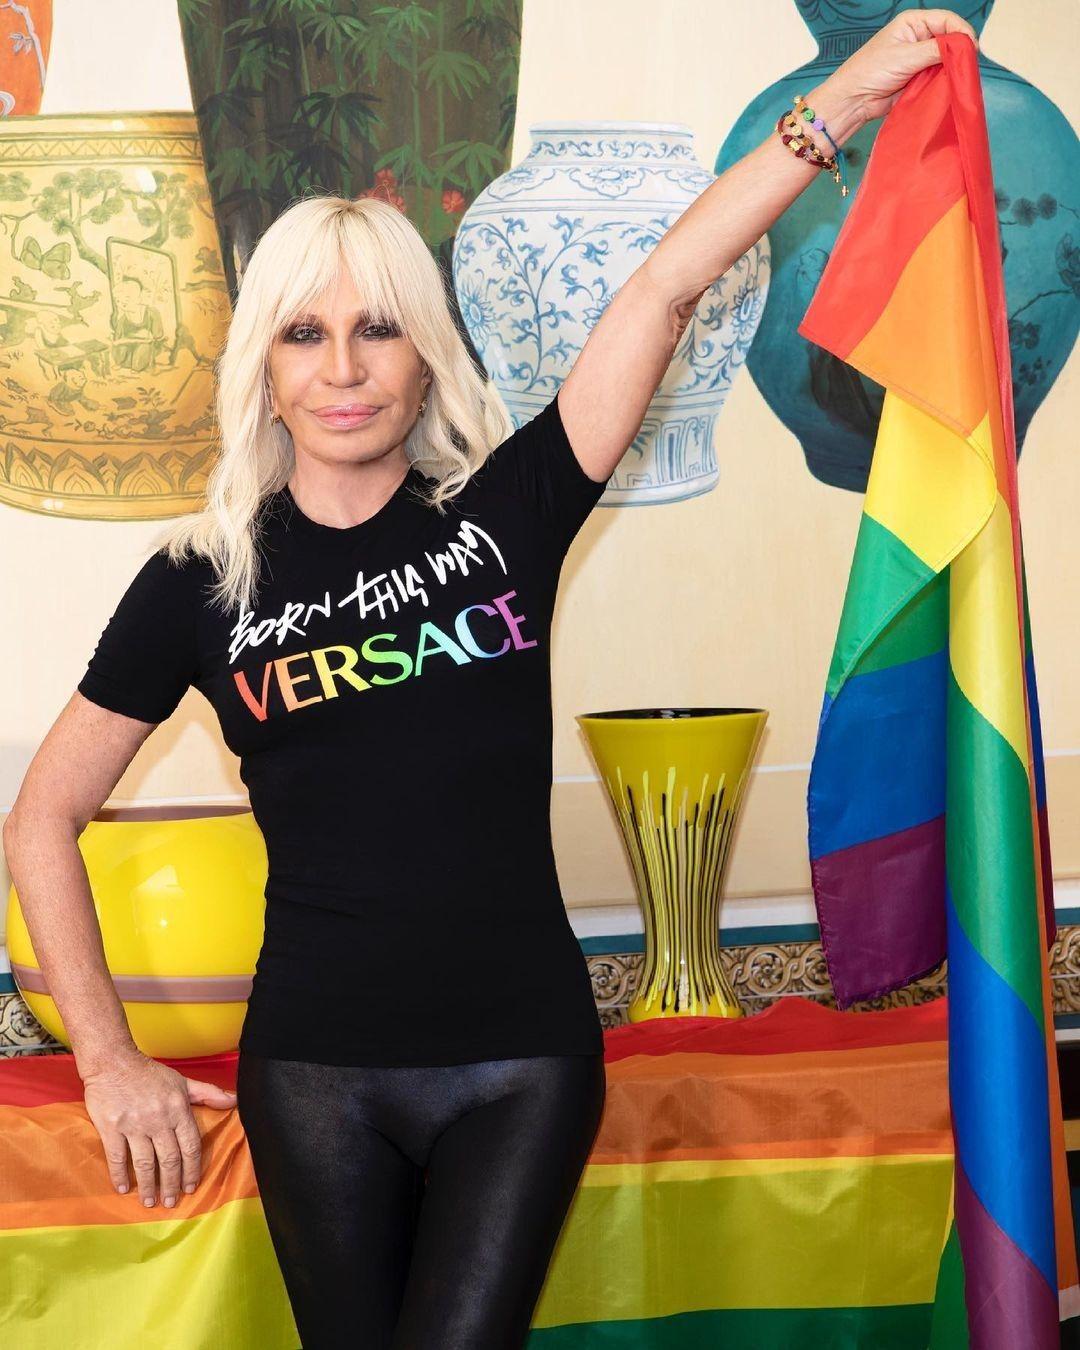 Versace pride month - neomag.